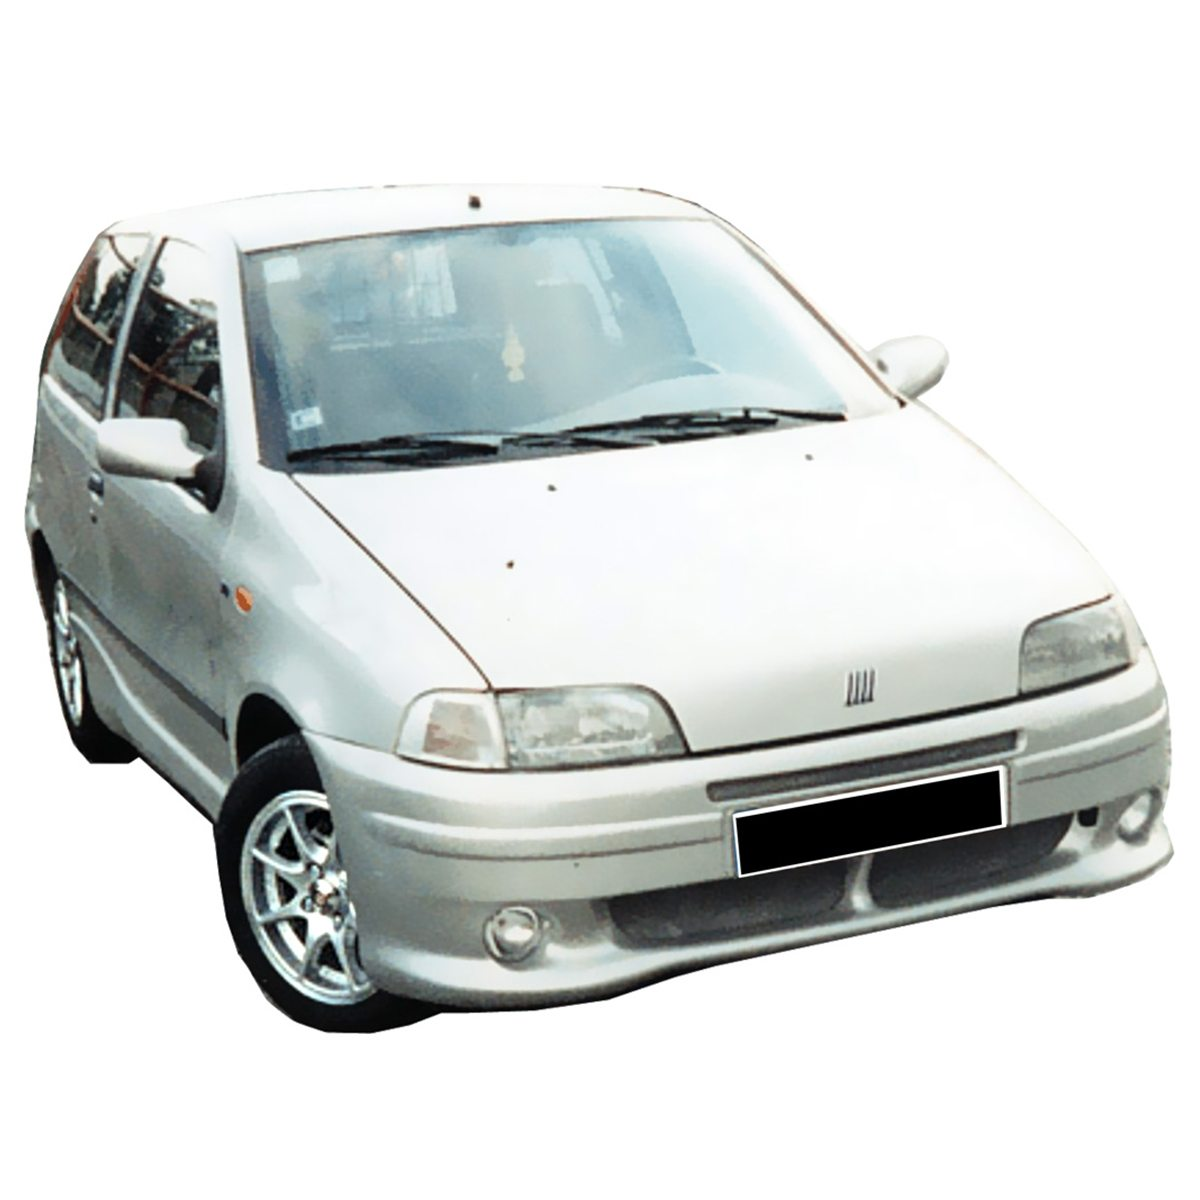 Fiat-Punto-Abarth-frt-PCA024